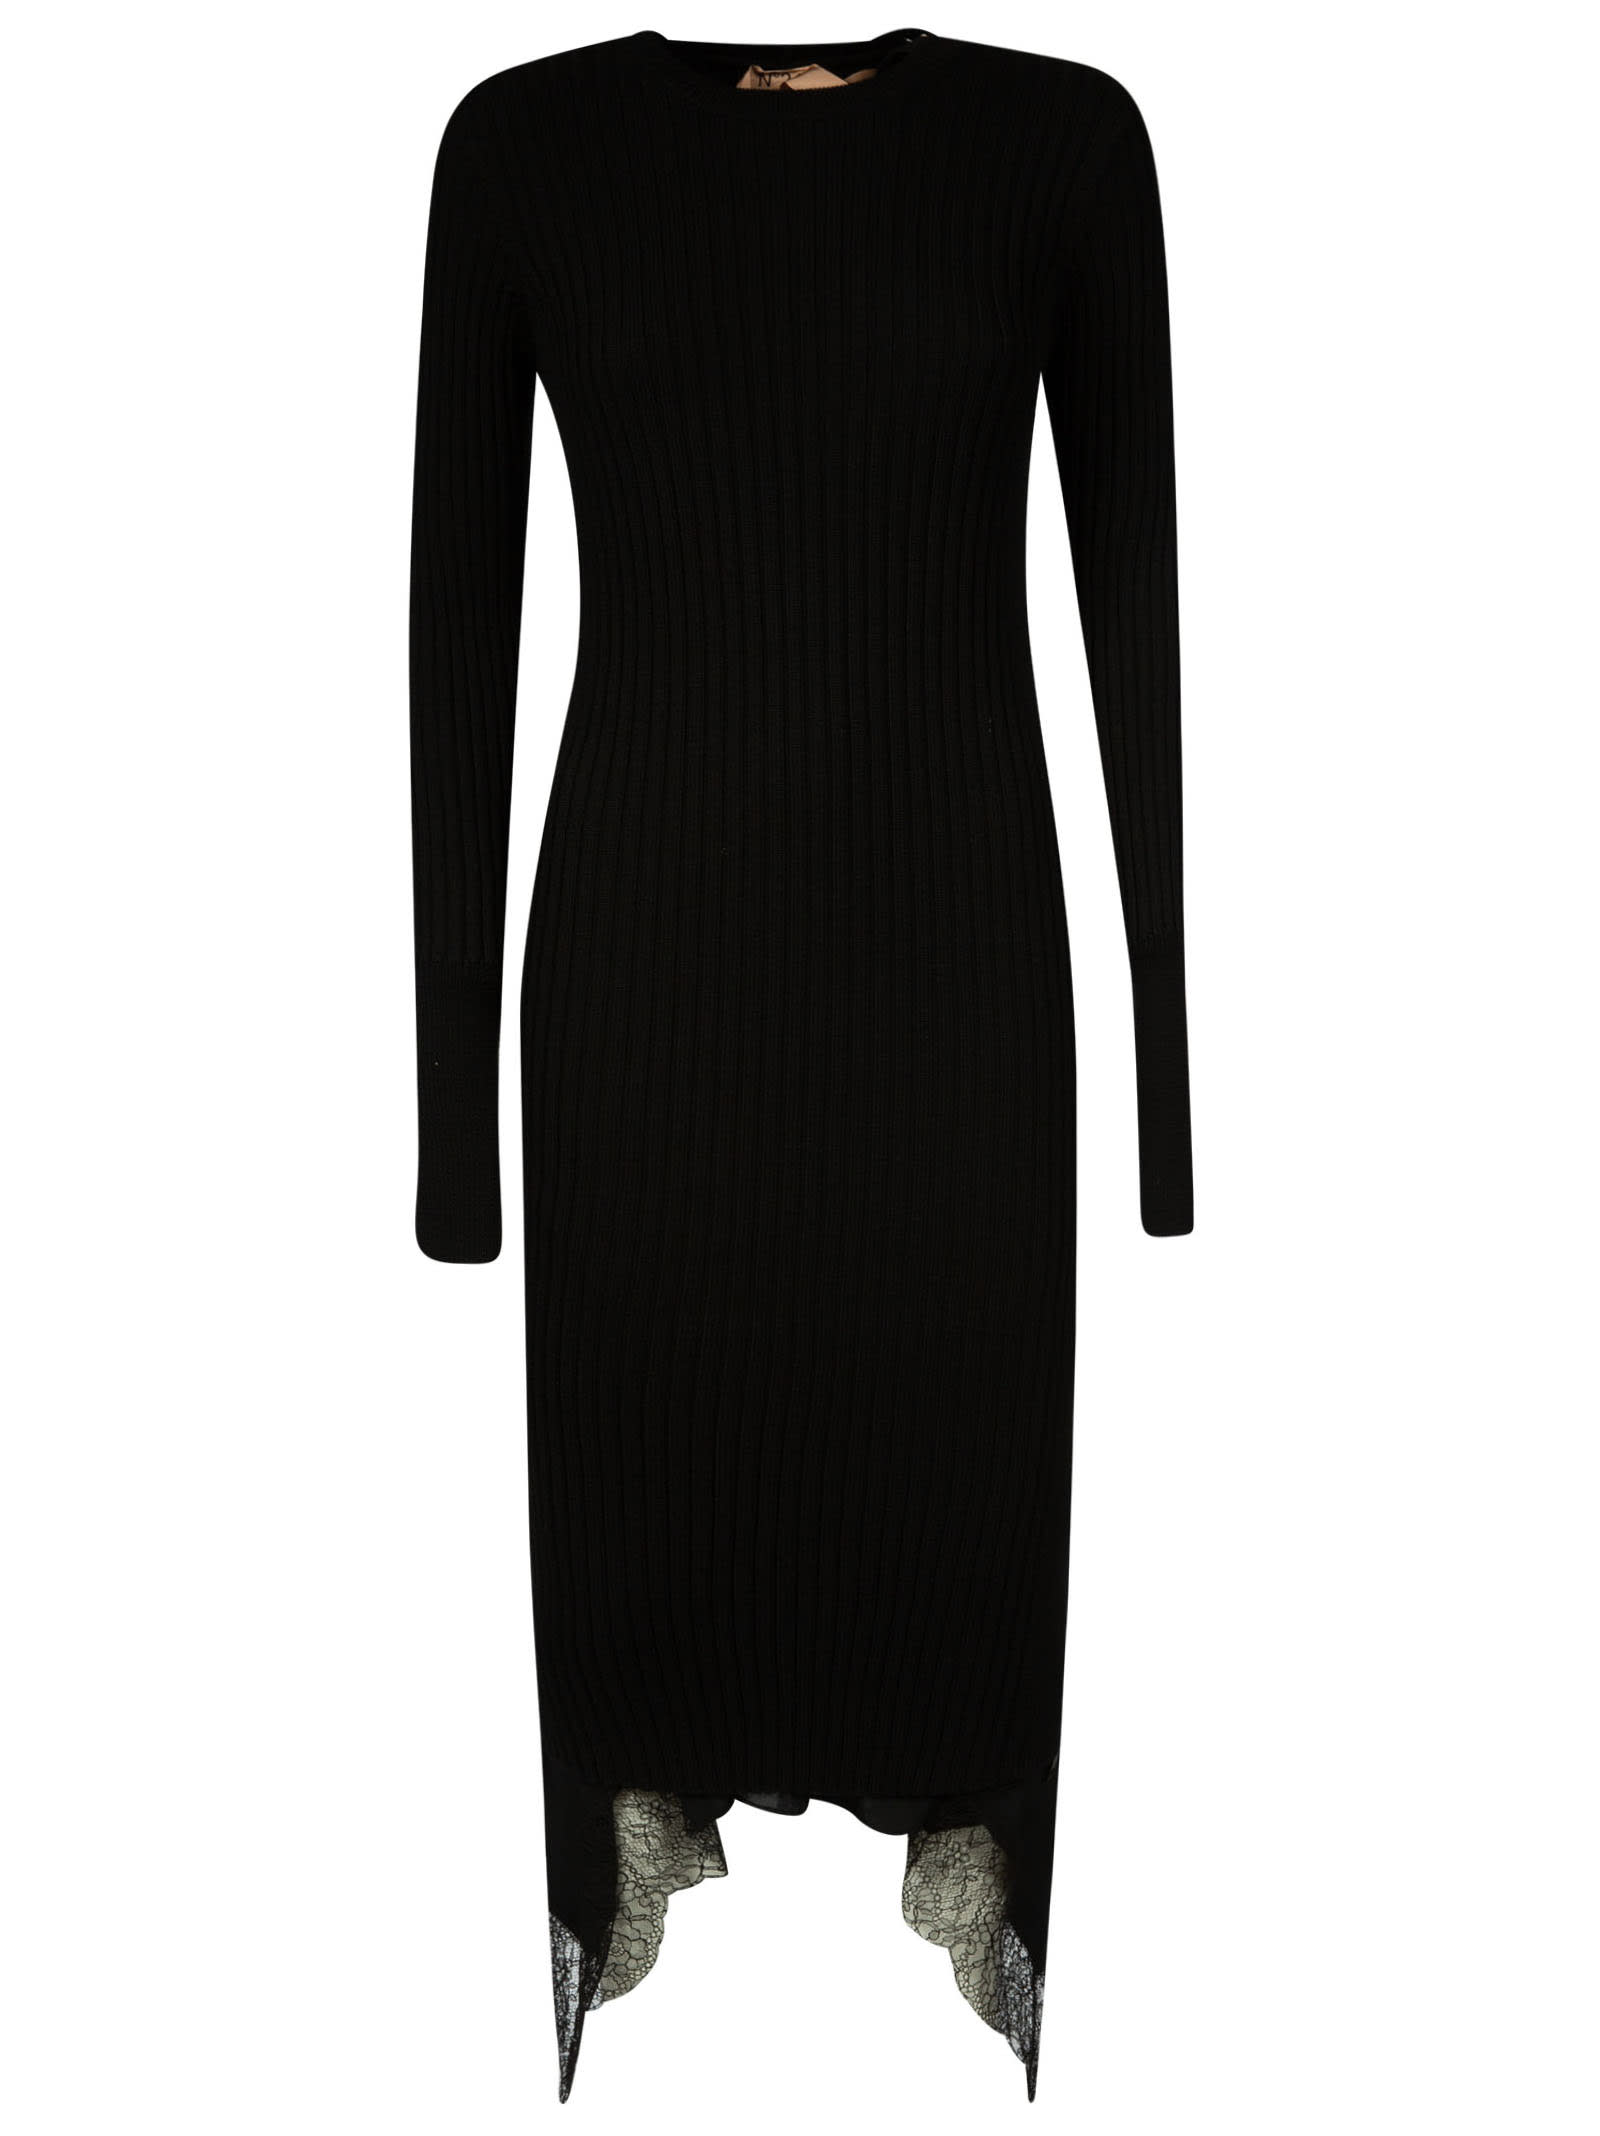 N.21 Laced Detail Long Dress